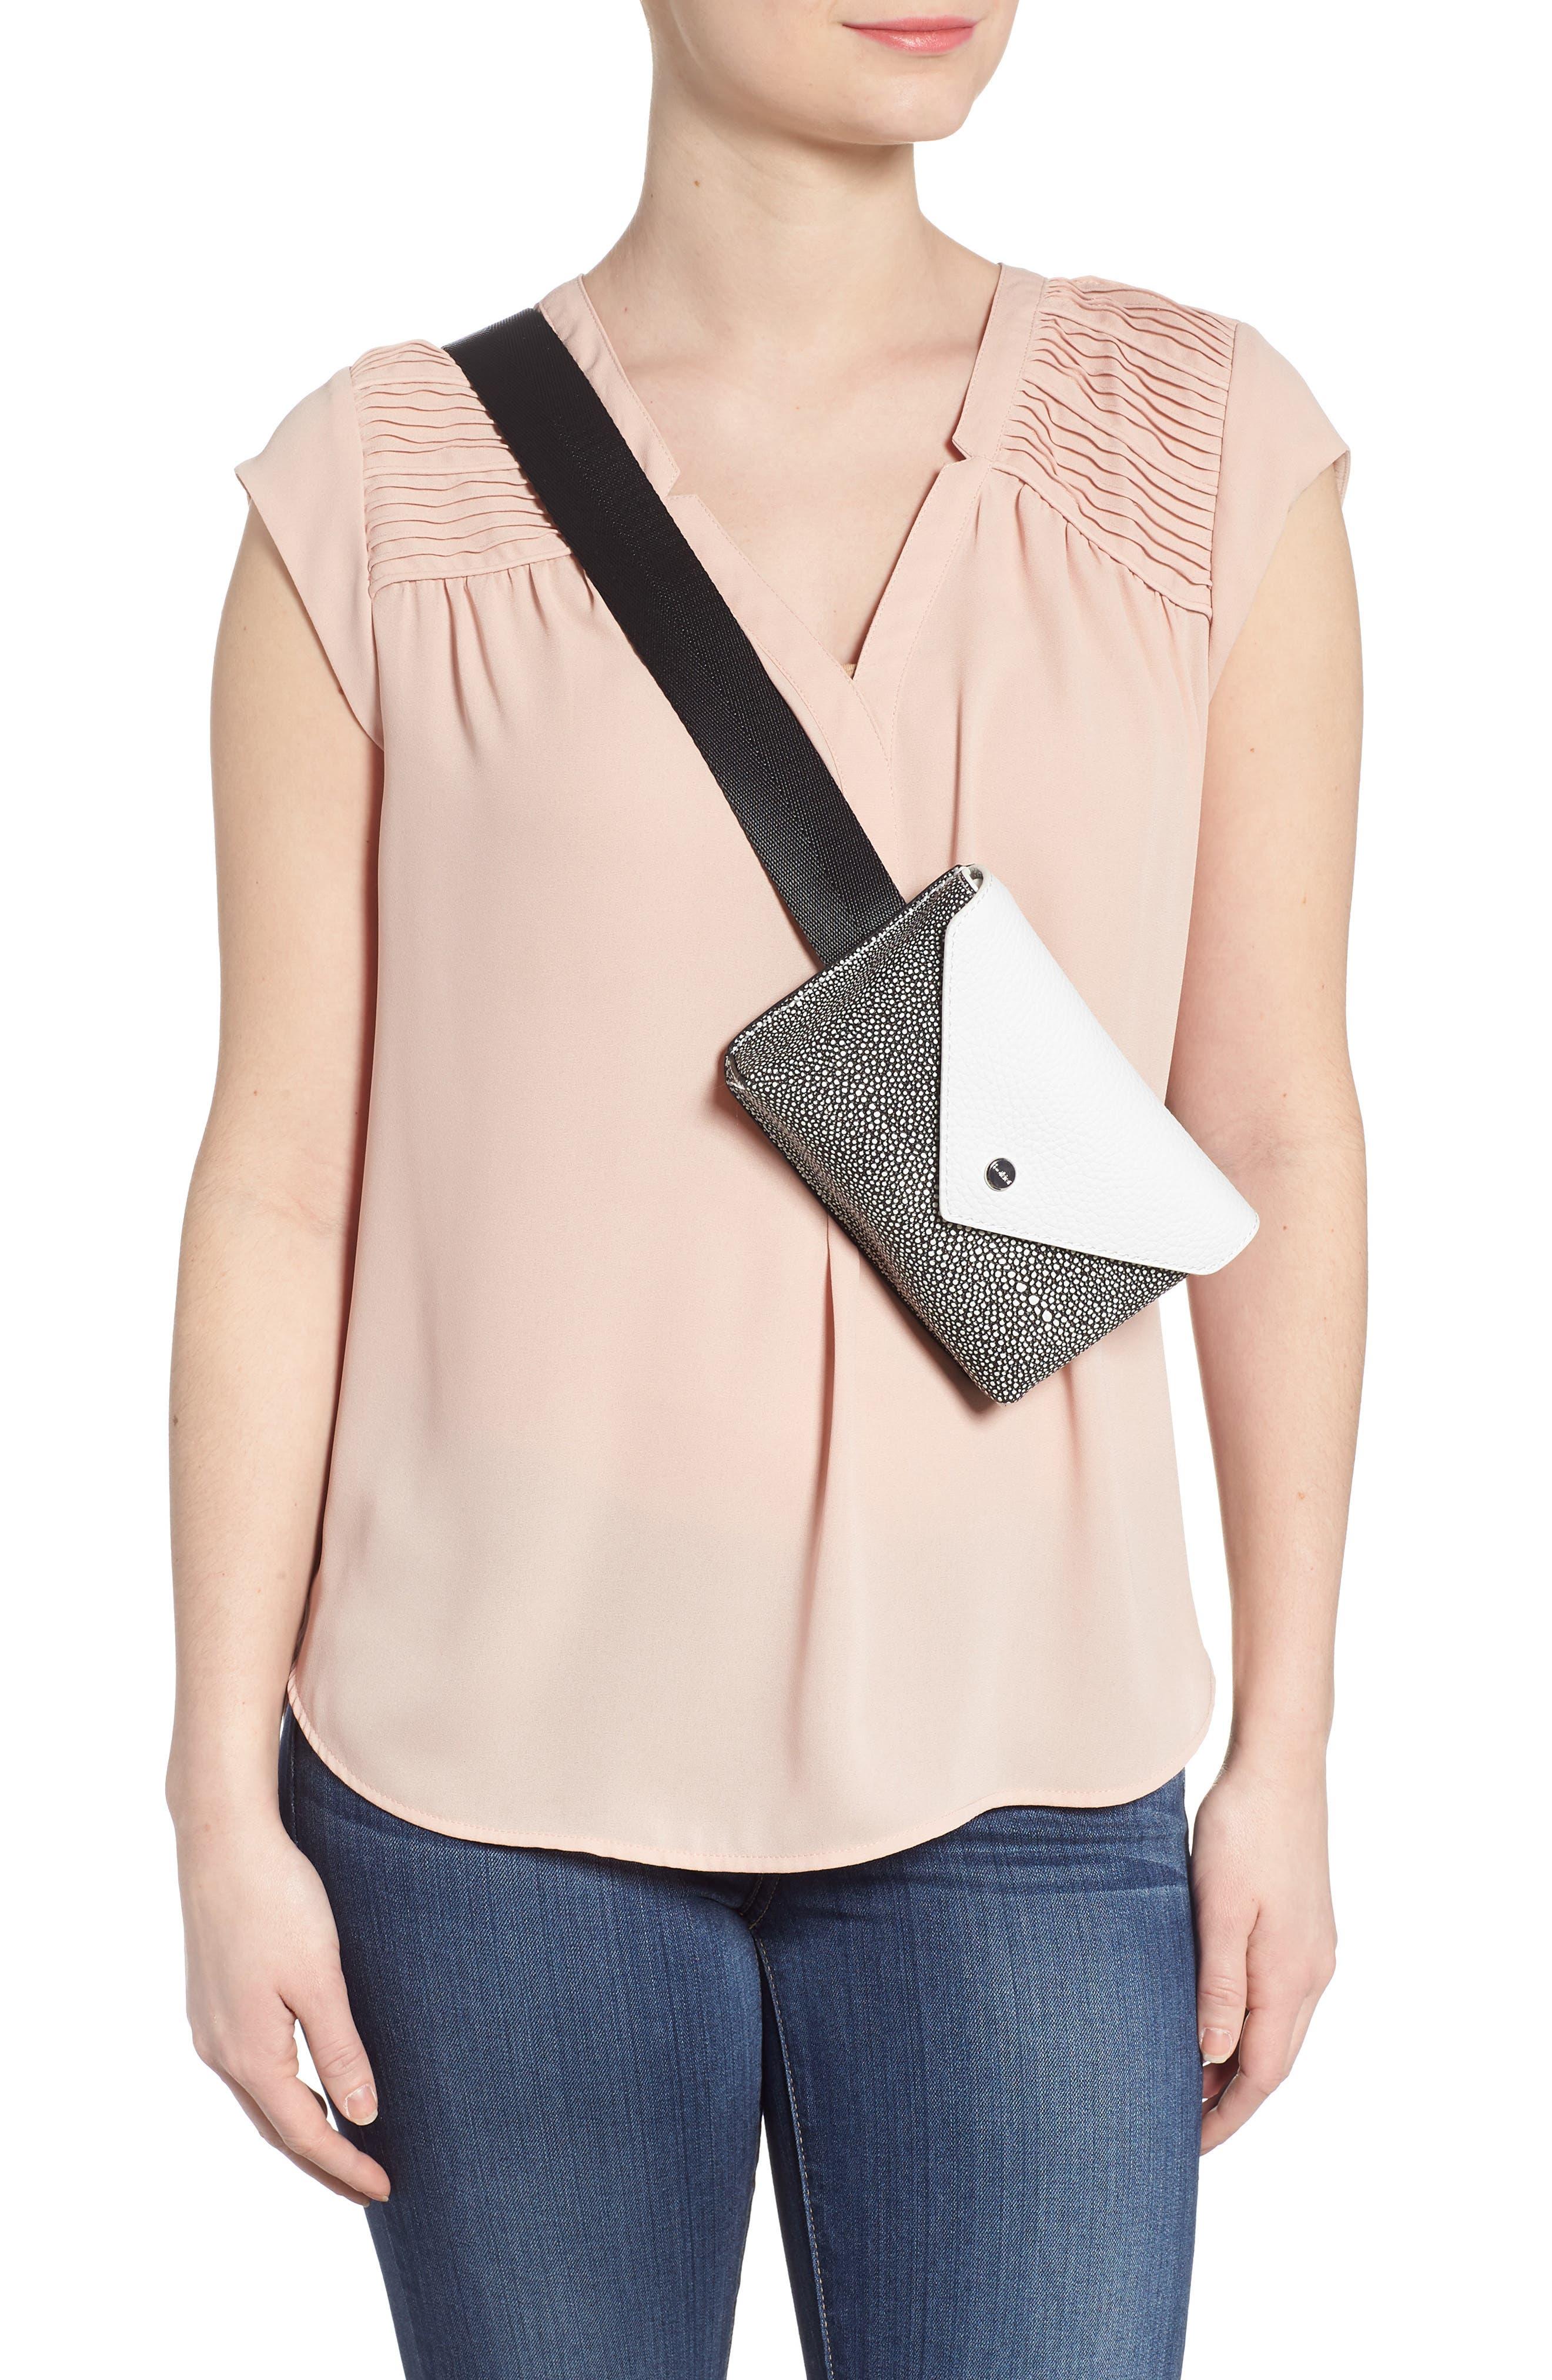 Vivi Calfskin Leather Convertible Belt Bag,                             Alternate thumbnail 3, color,                             Chalk Stingray